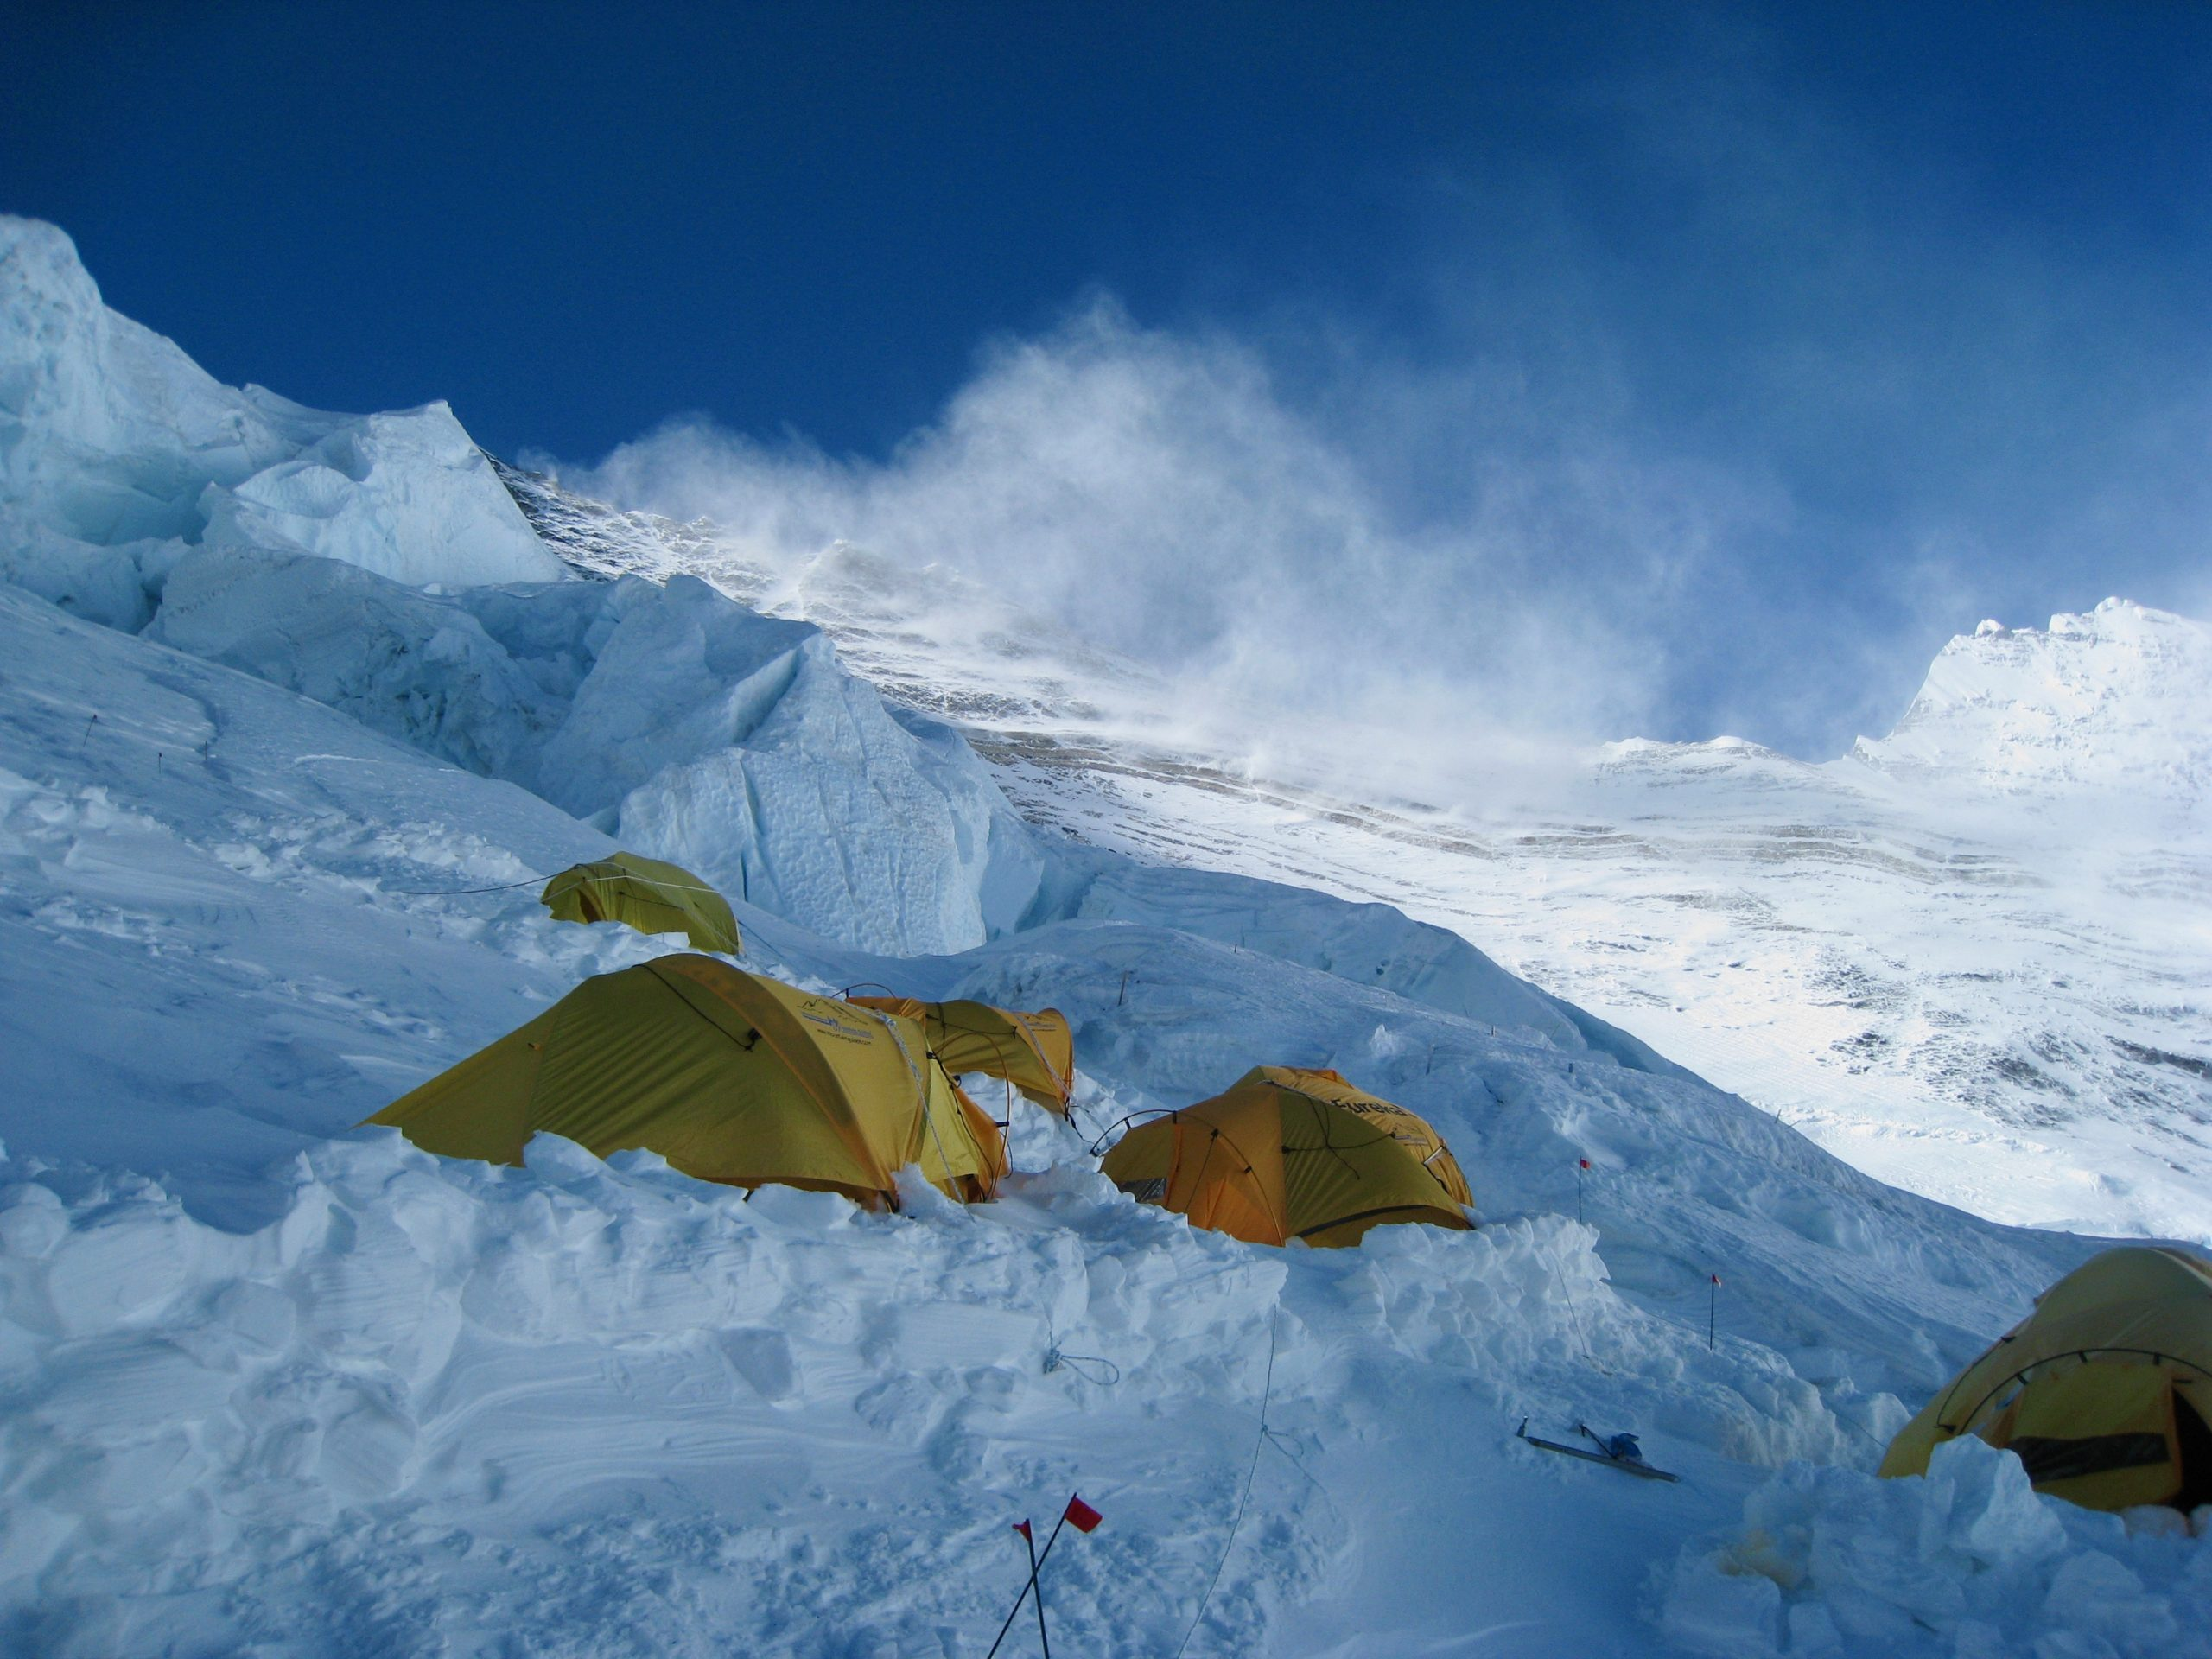 Virtual Everest 2020 A Stormy Lhotse Face The Blog On Alanarnette Com